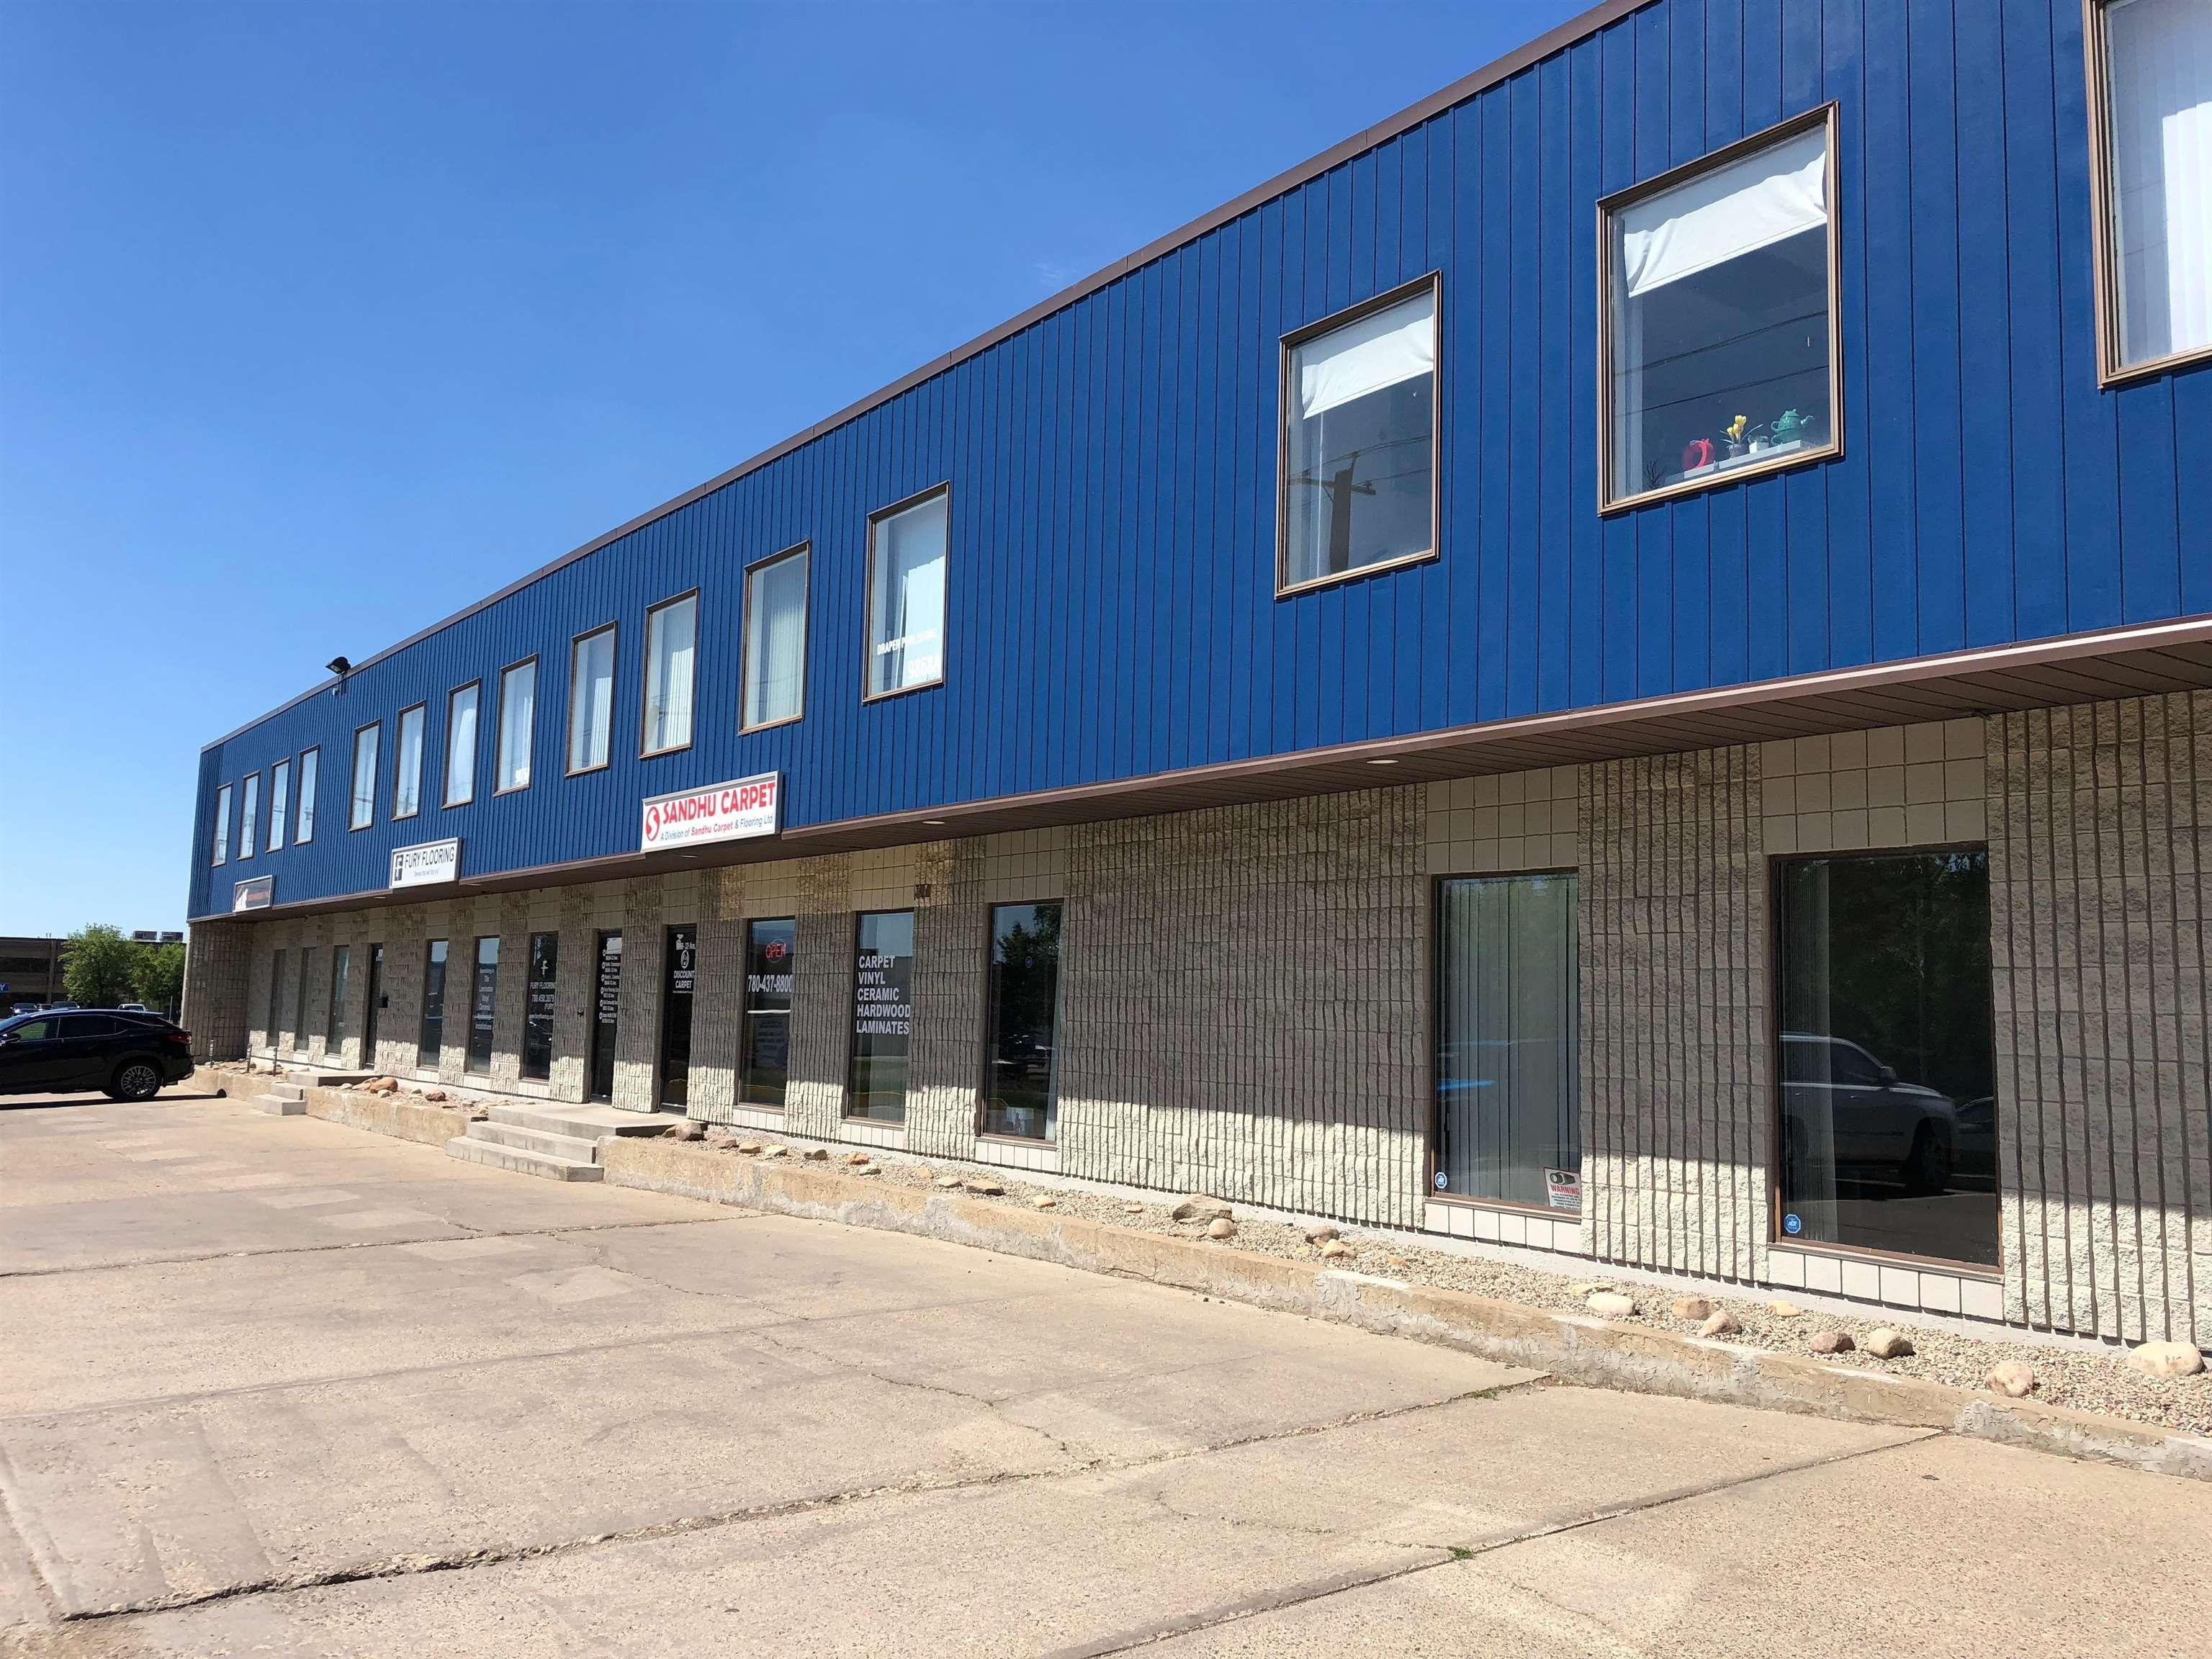 Main Photo: 9856 33 Avenue in Edmonton: Zone 41 Industrial for lease : MLS®# E4263159